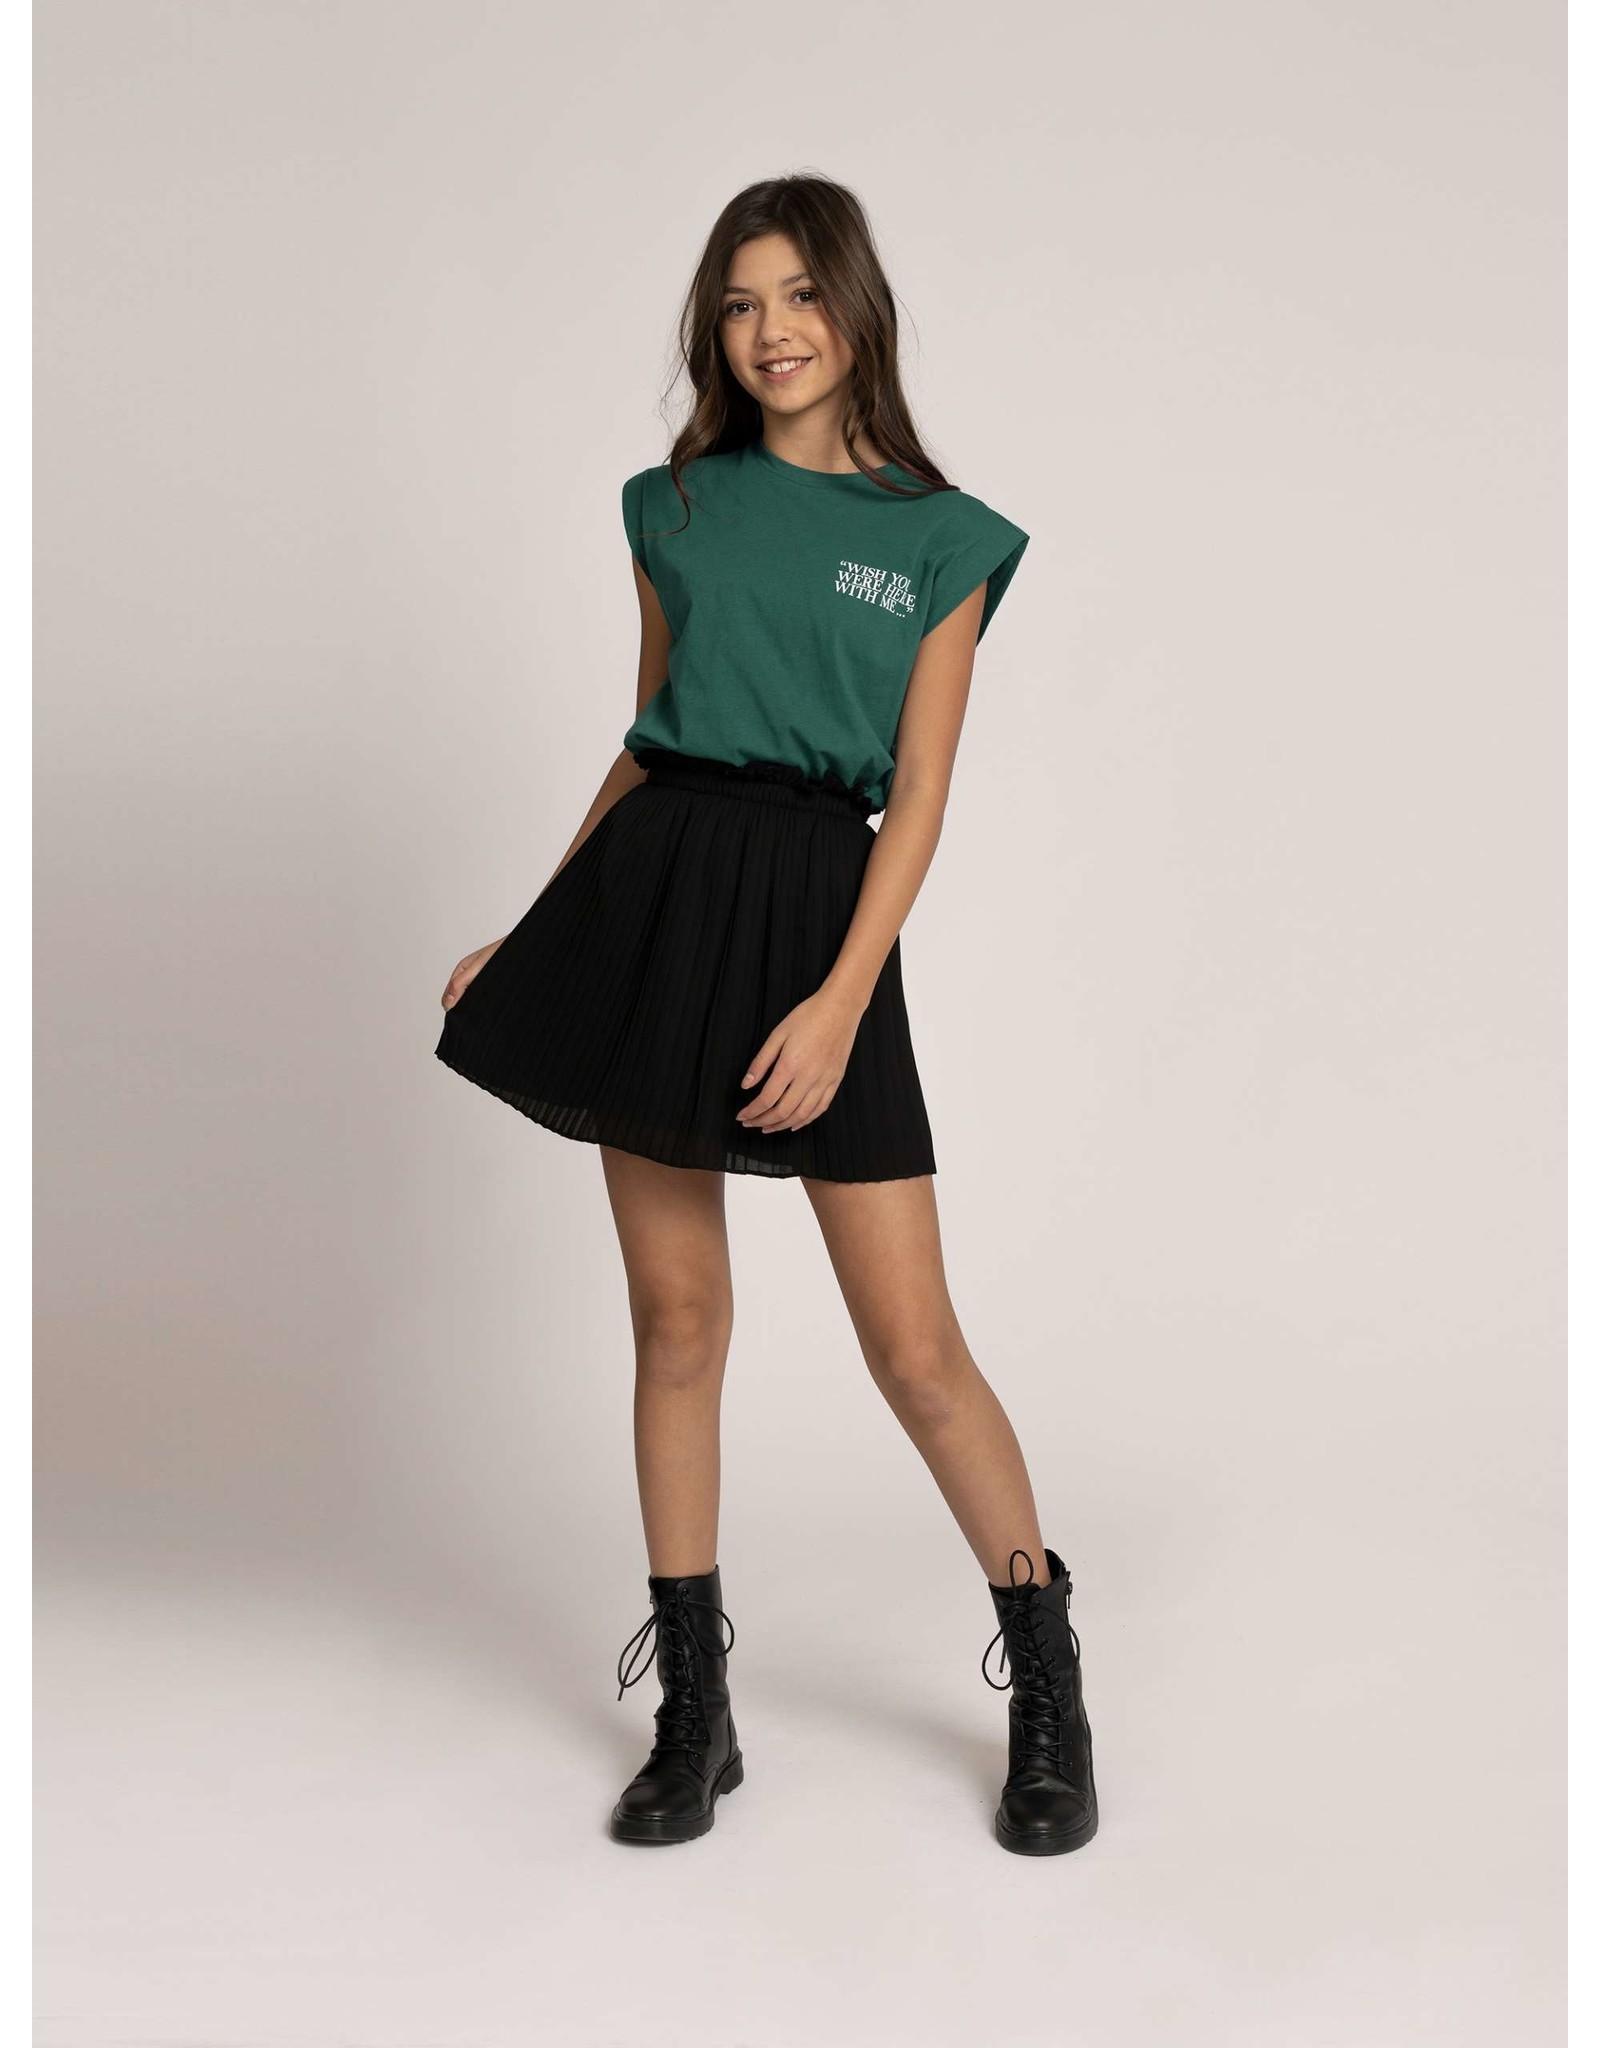 Nik&Nik NIK&NIK Wish You T-shirt Pine green